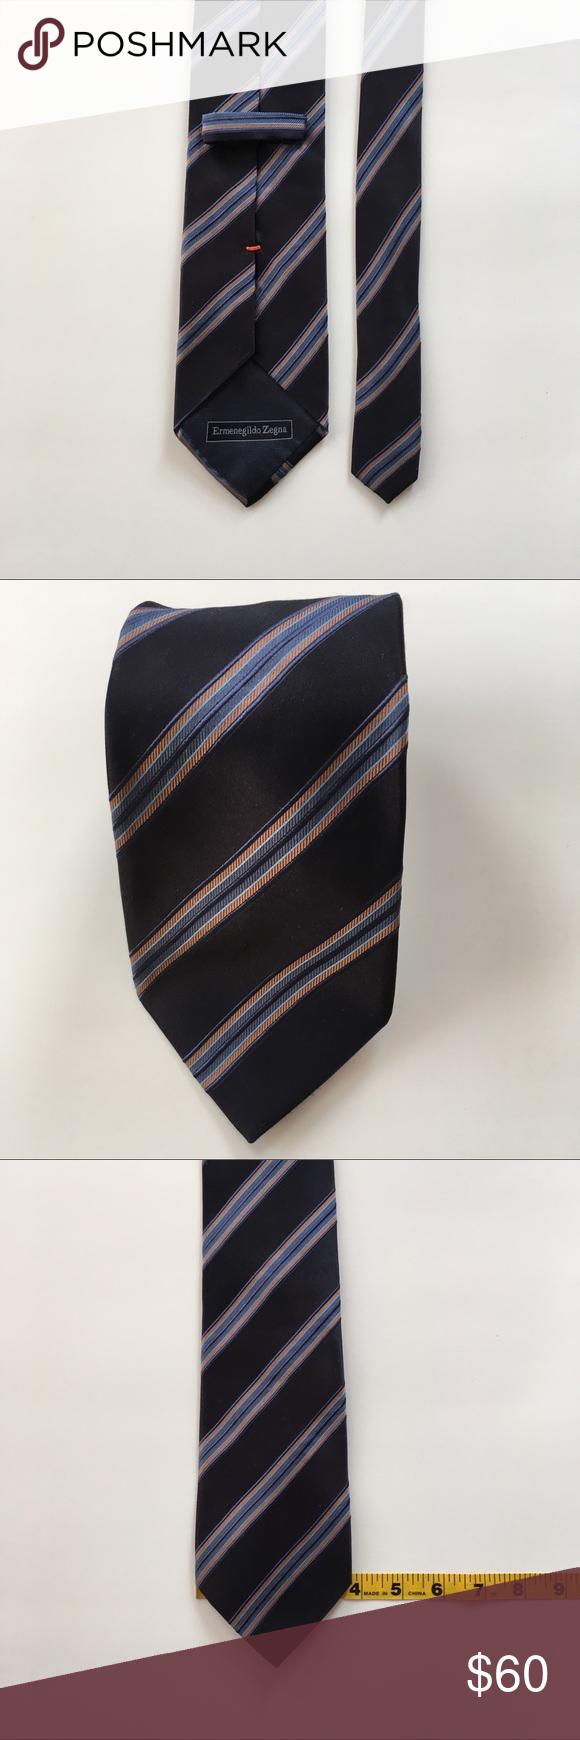 1a9567f6 Ermenegildo zegna tie made in Italy silk pa0087   My Posh Picks ...